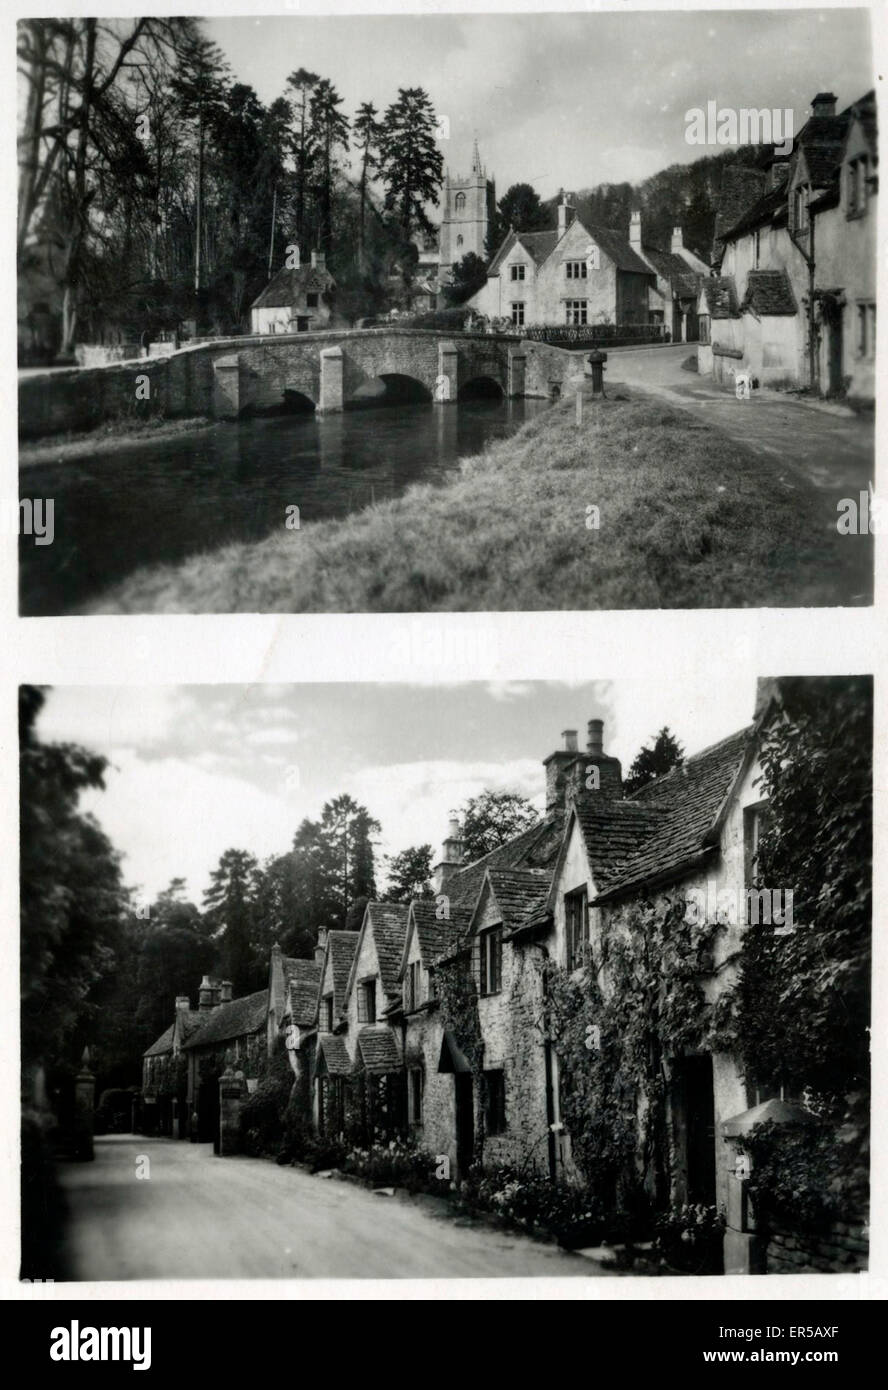 Village, Awaiting Identification, England.  1950s - Stock Image